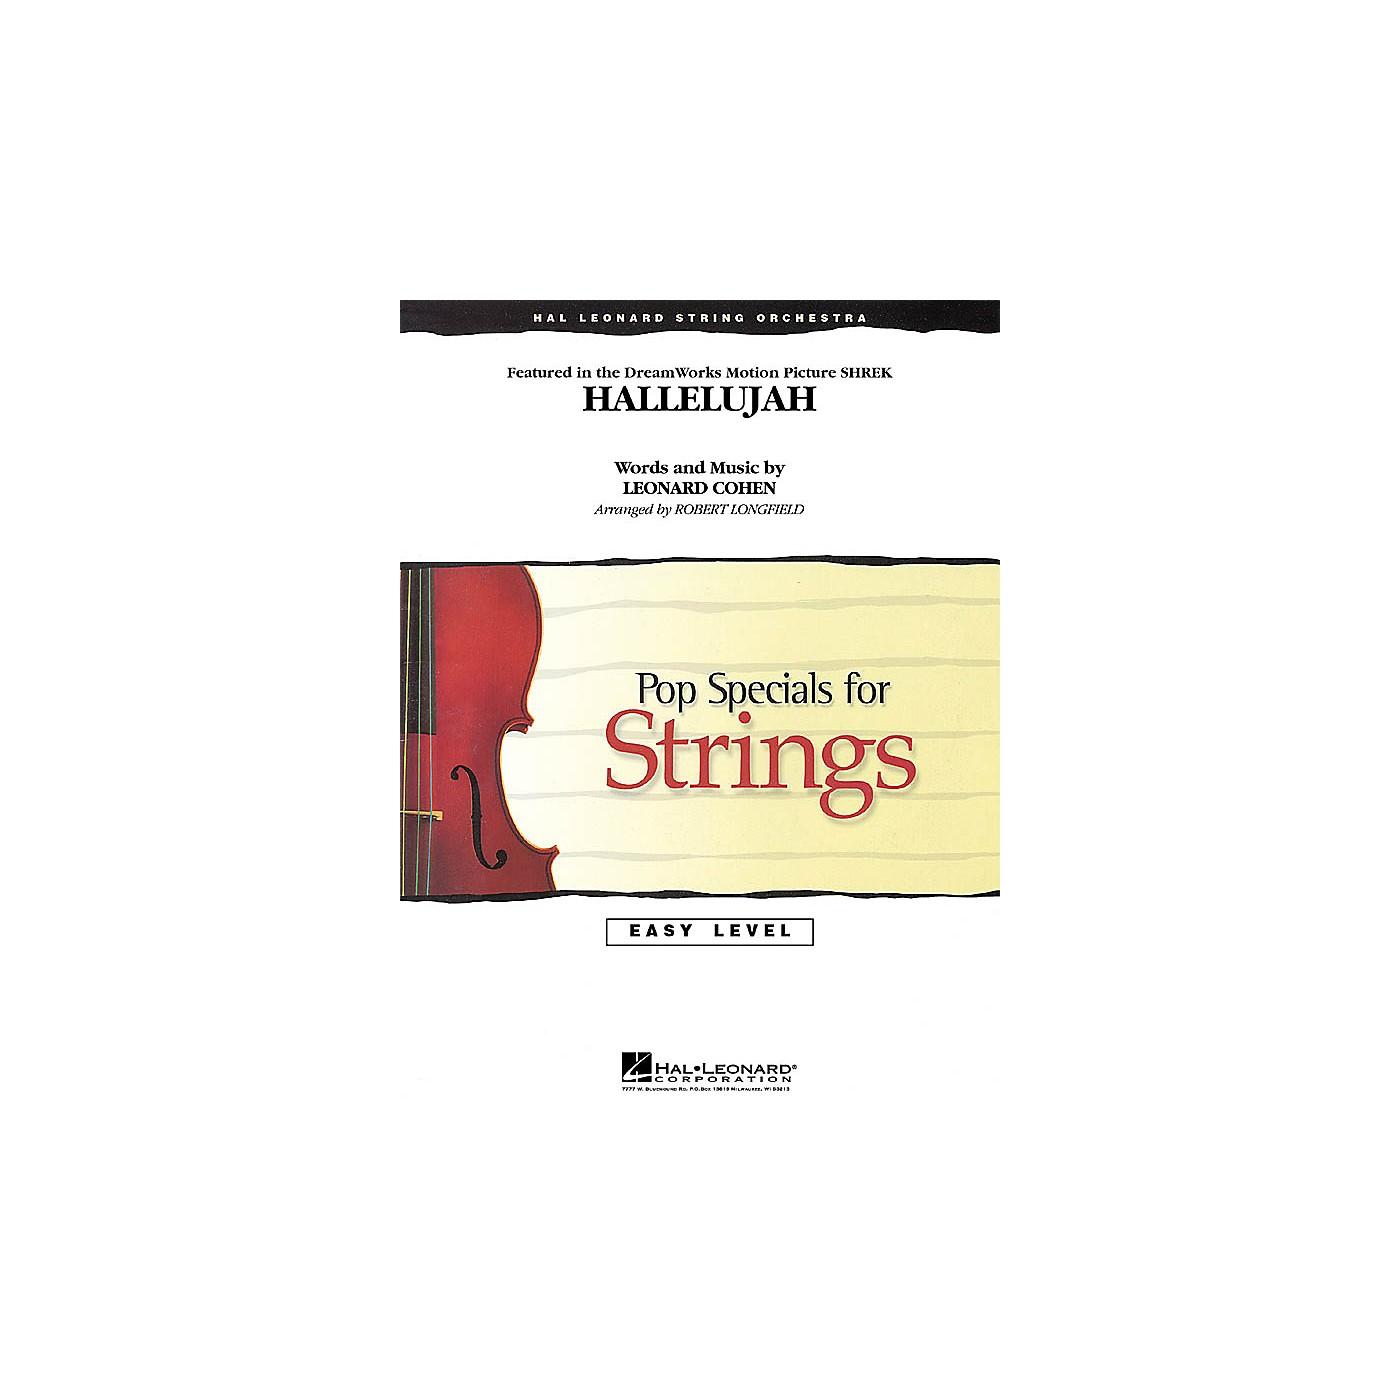 Hal Leonard Hallelujah Easy Pop Specials For Strings Series Arranged by Robert Longfield thumbnail